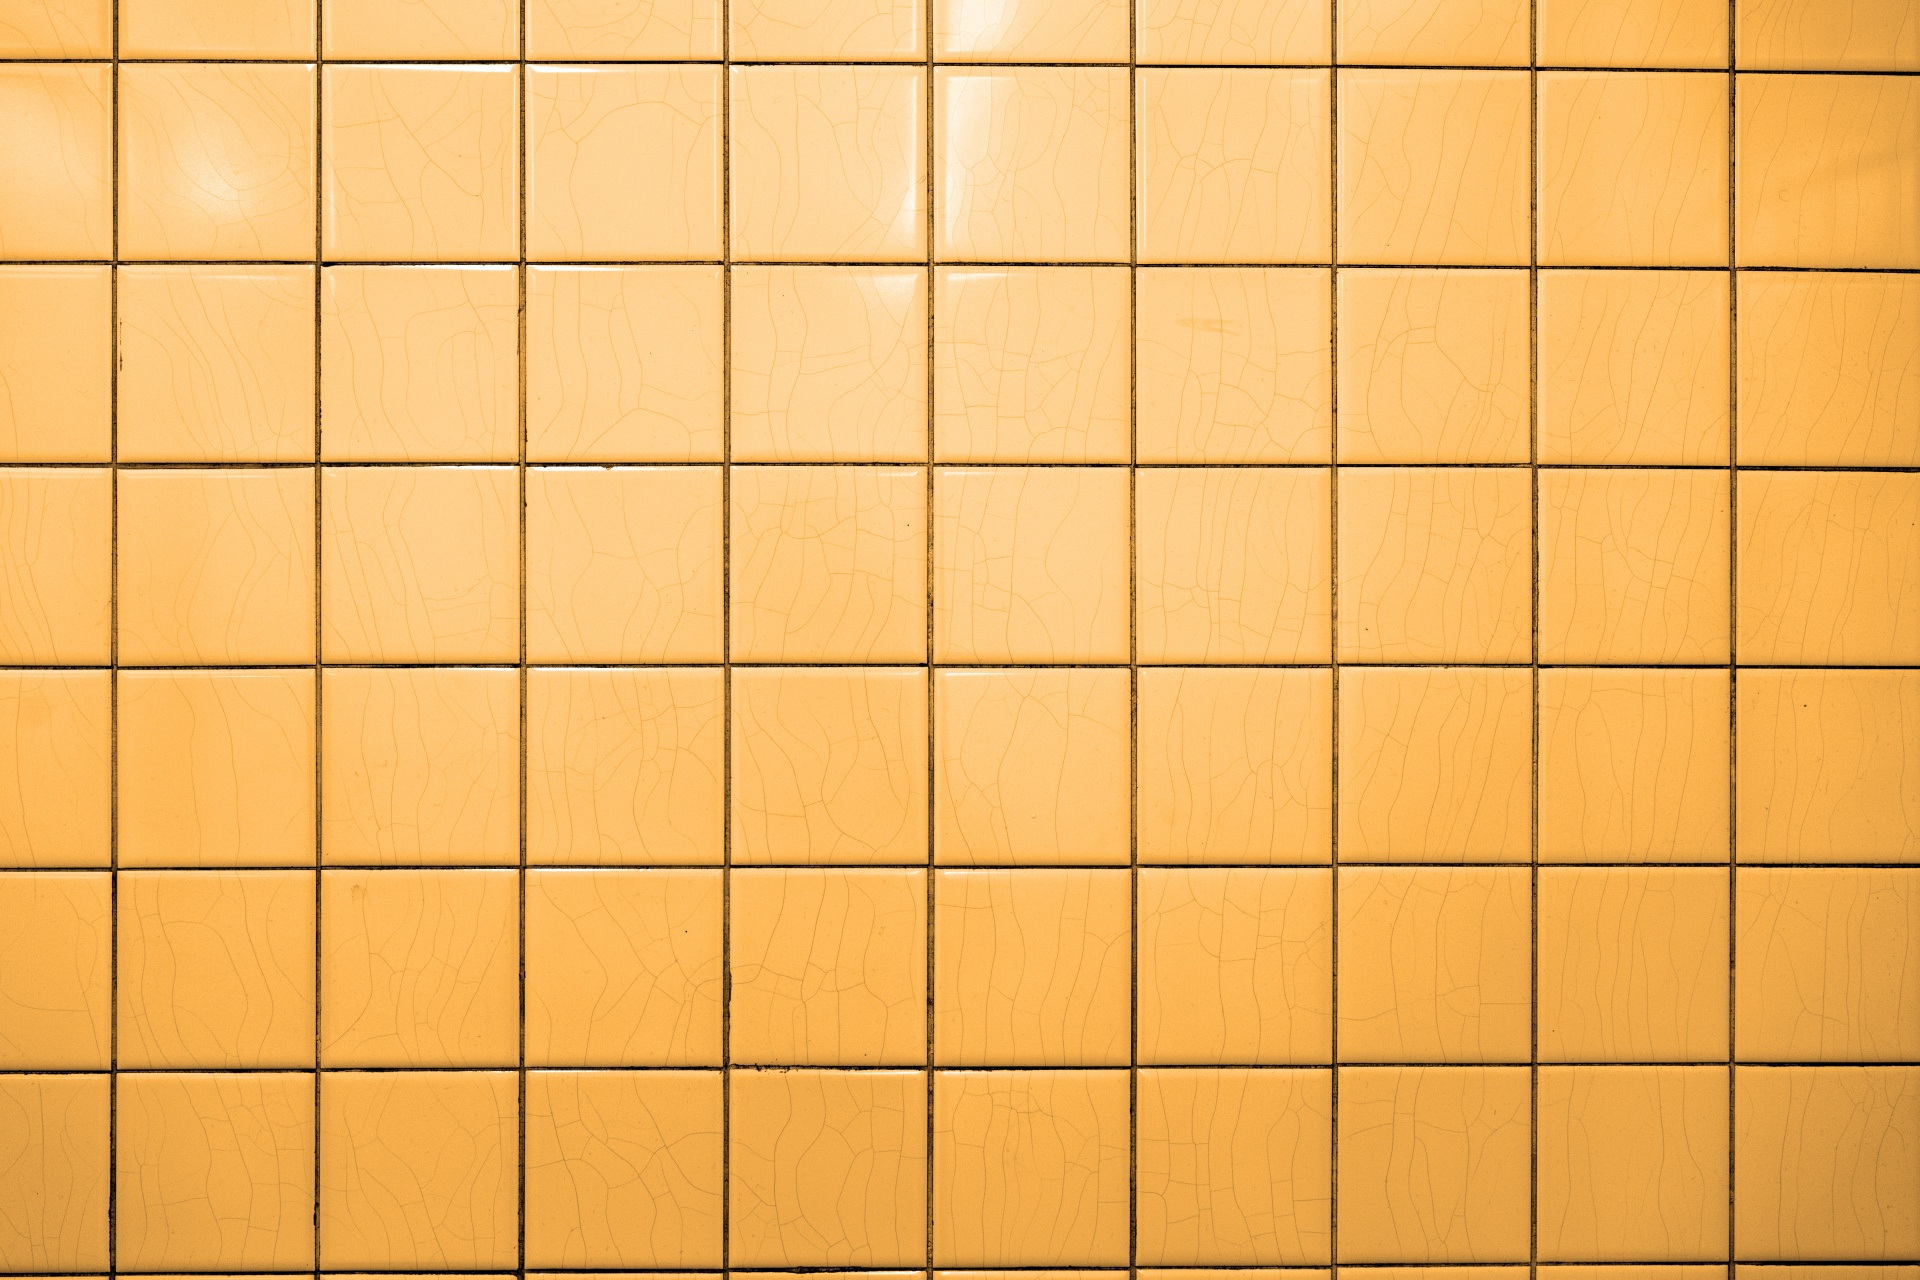 Yellow Tiles Free Stock Photo Public Domain Pictures